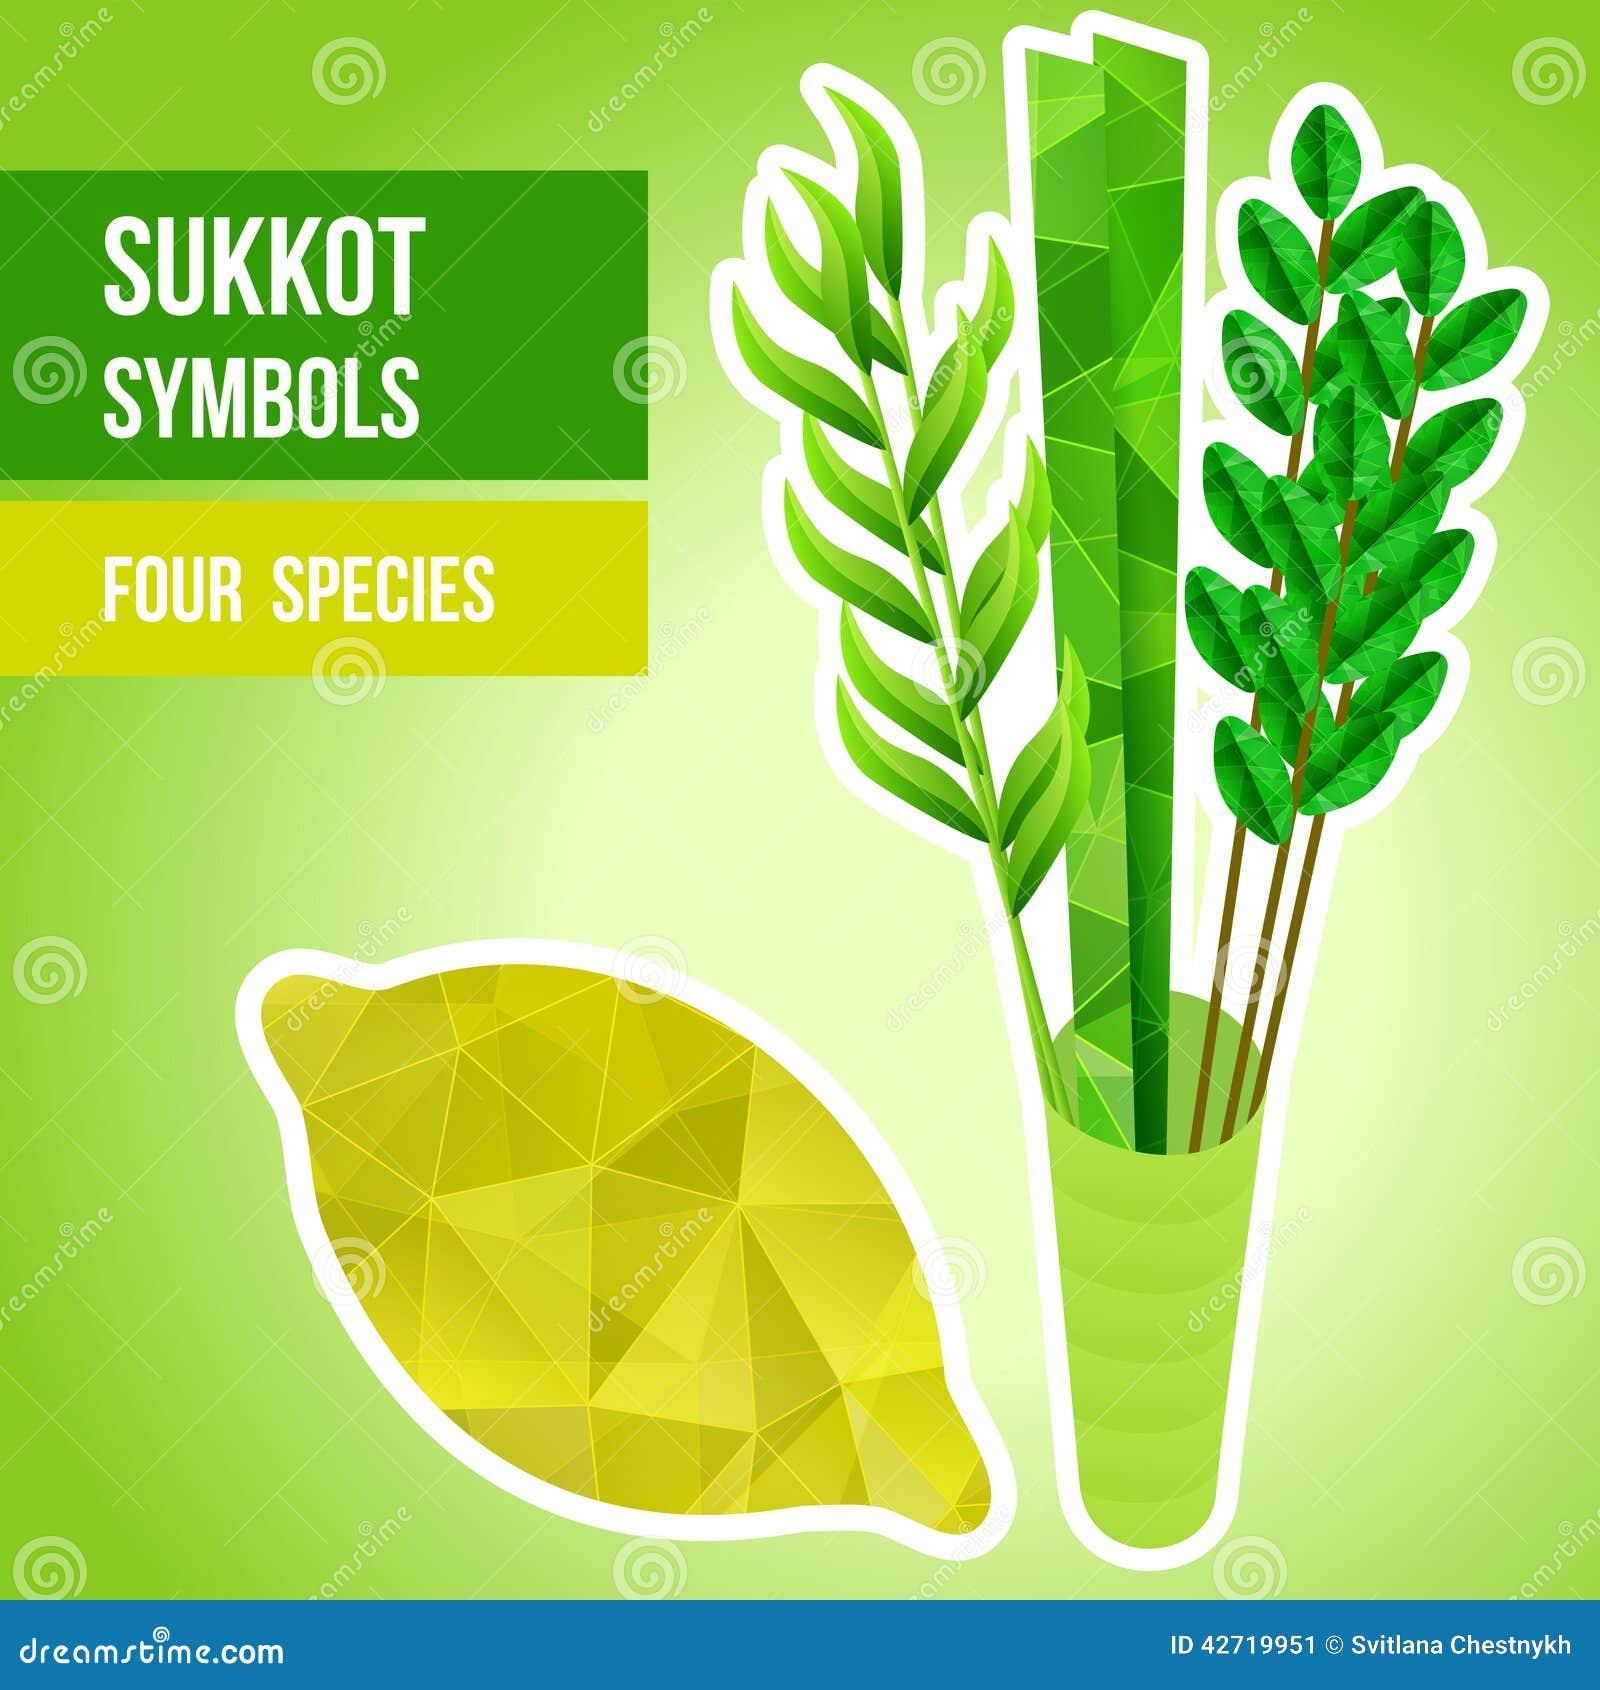 Sukkot symbols stock image image of bunch myrtle feast 42719951 sukkot symbols biocorpaavc